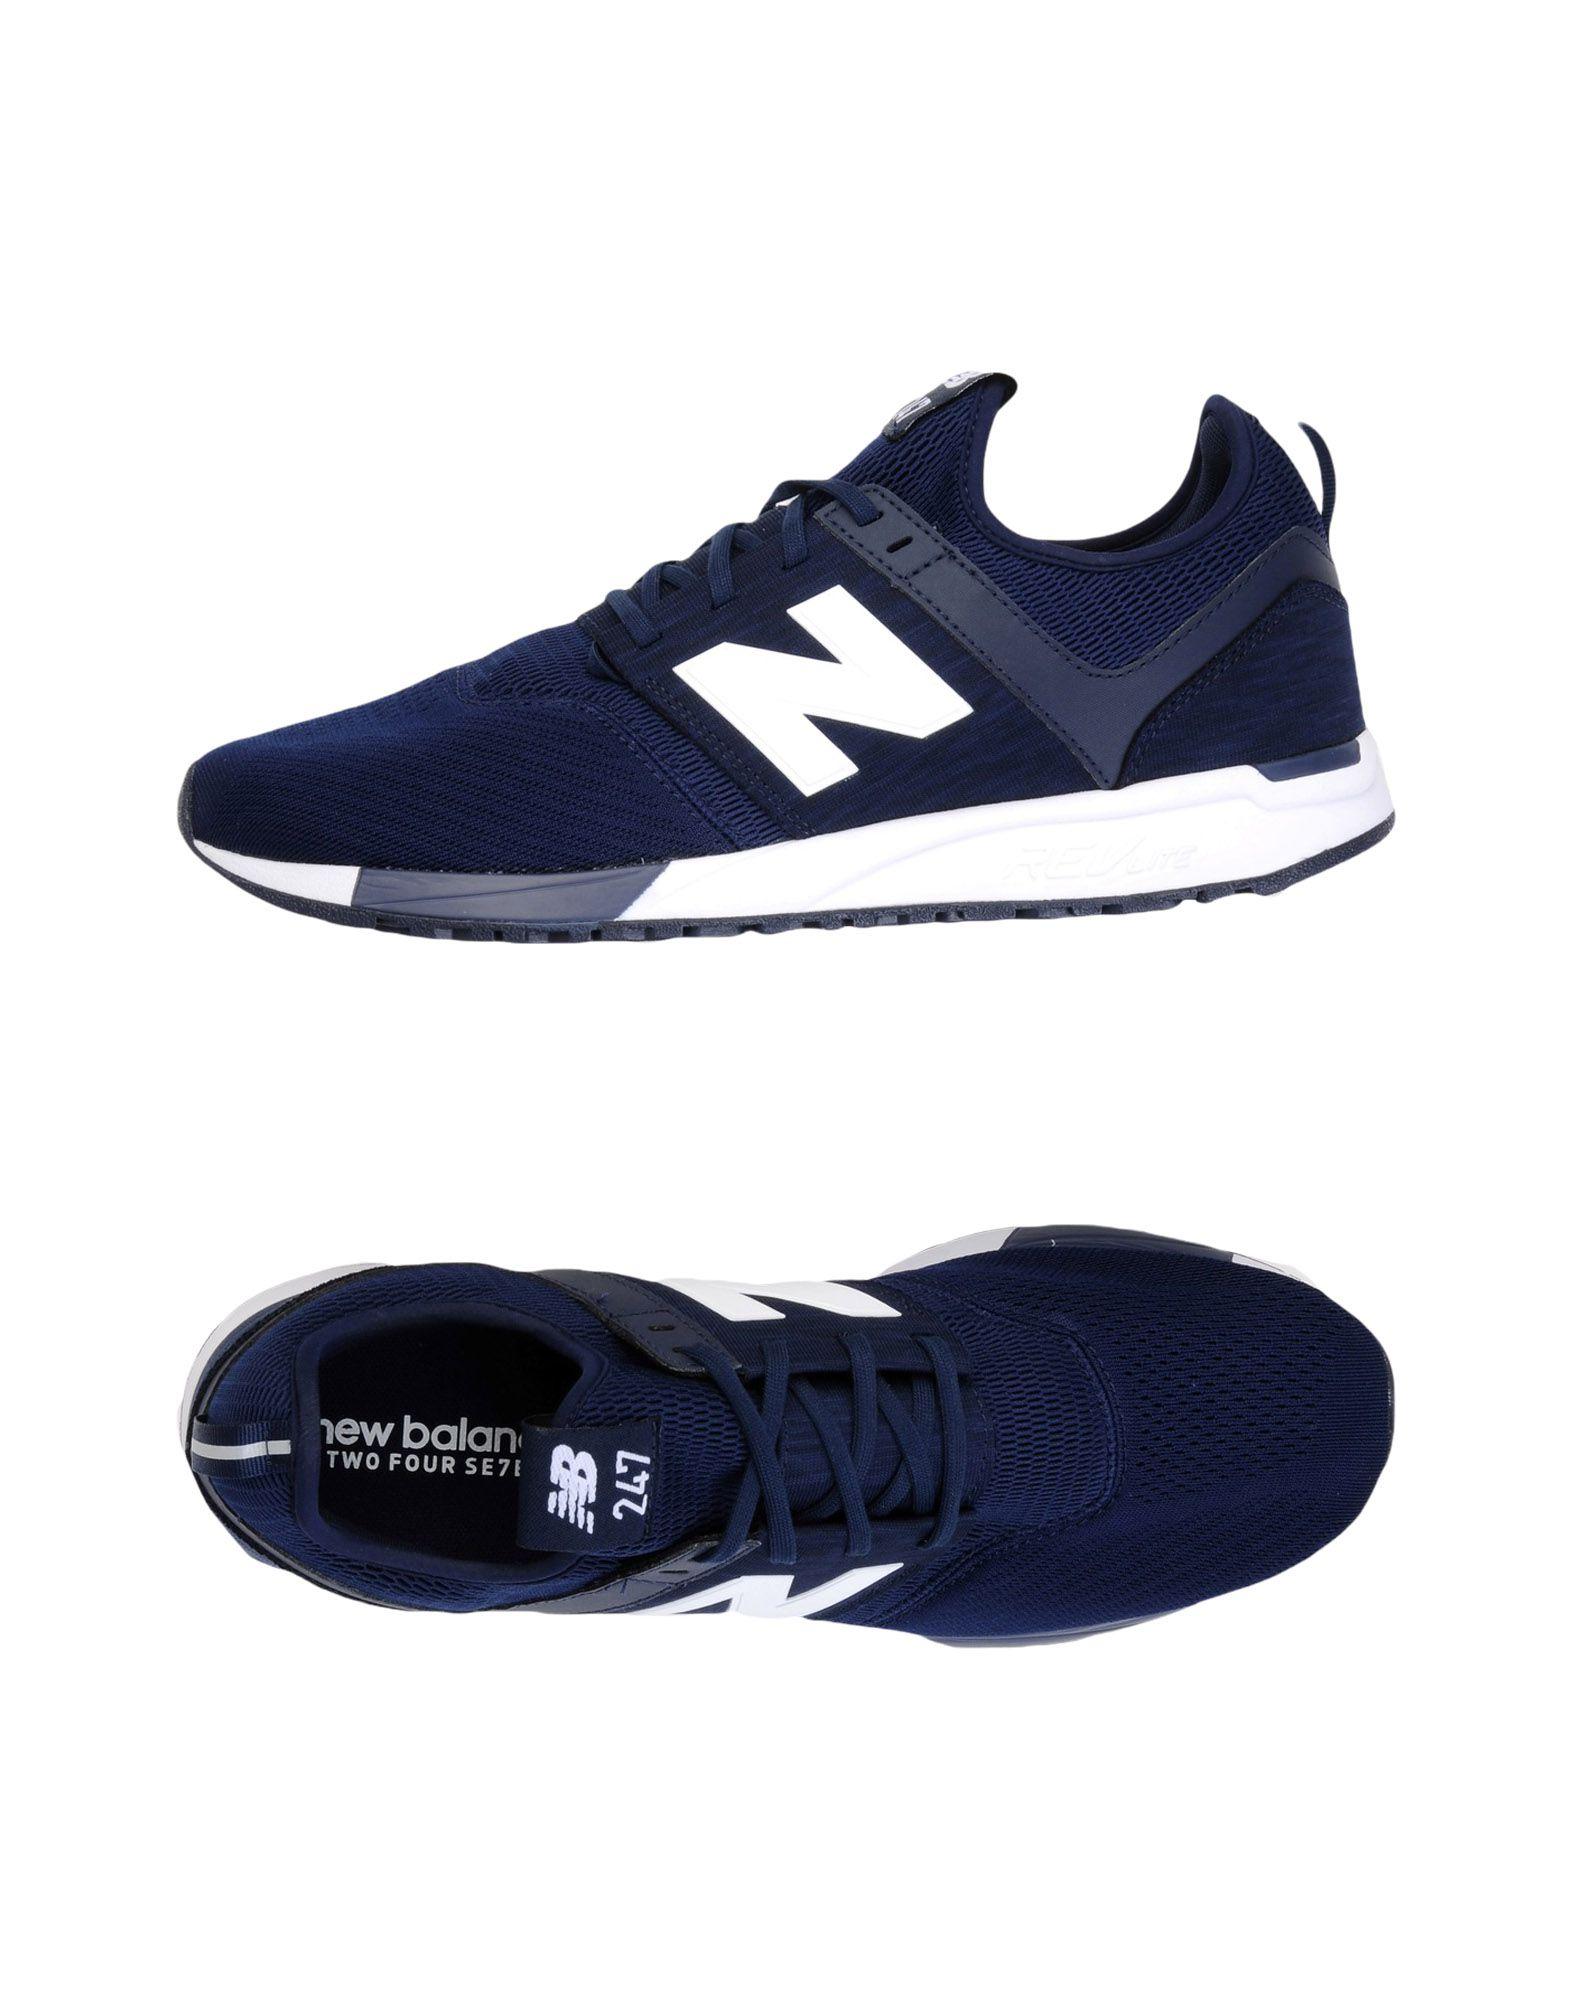 New Balance 247 247 247 Mesh/Synthetic  11466963AJ Neue Schuhe 132f2e